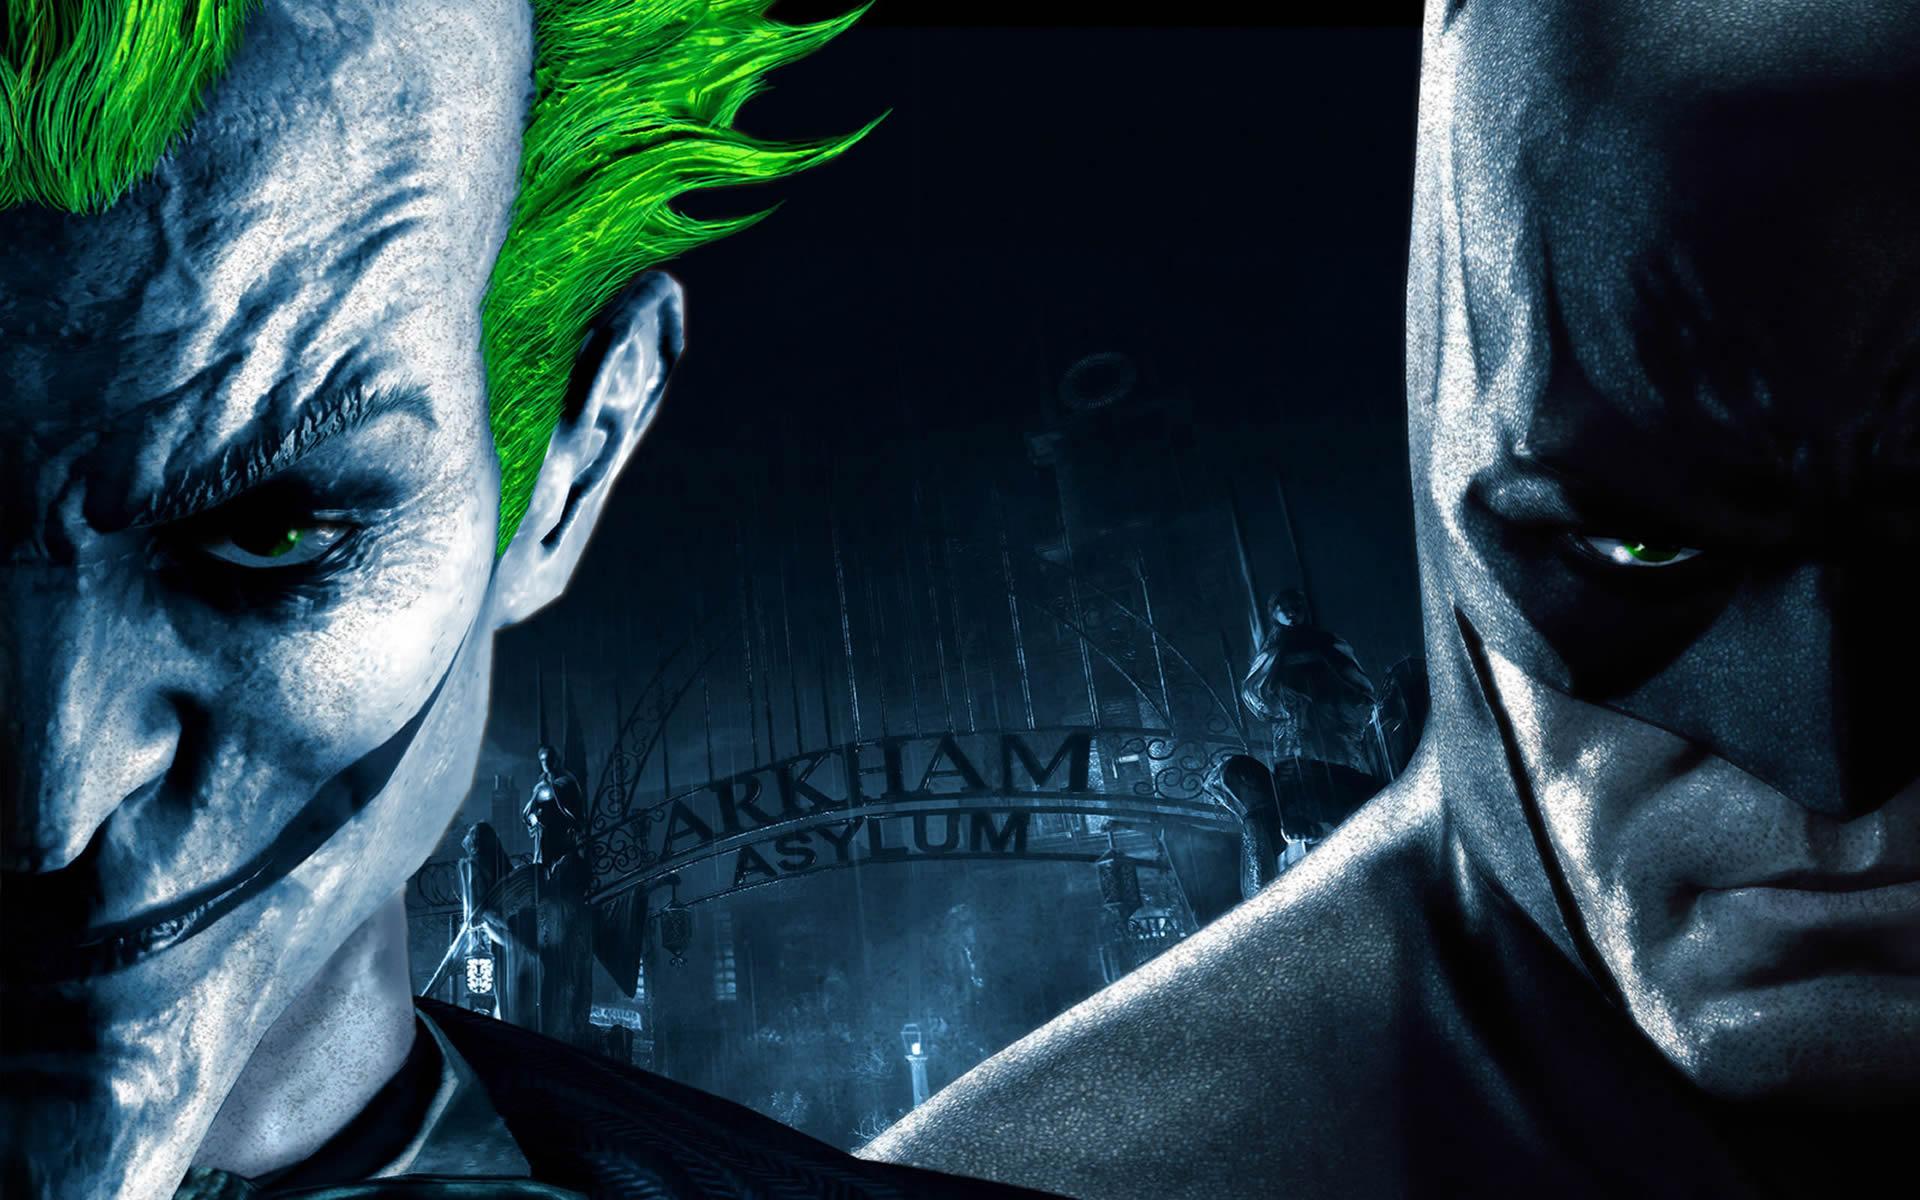 Batman And Joker   Superhero Games Wallpaper Image featuring Batman 1920x1200